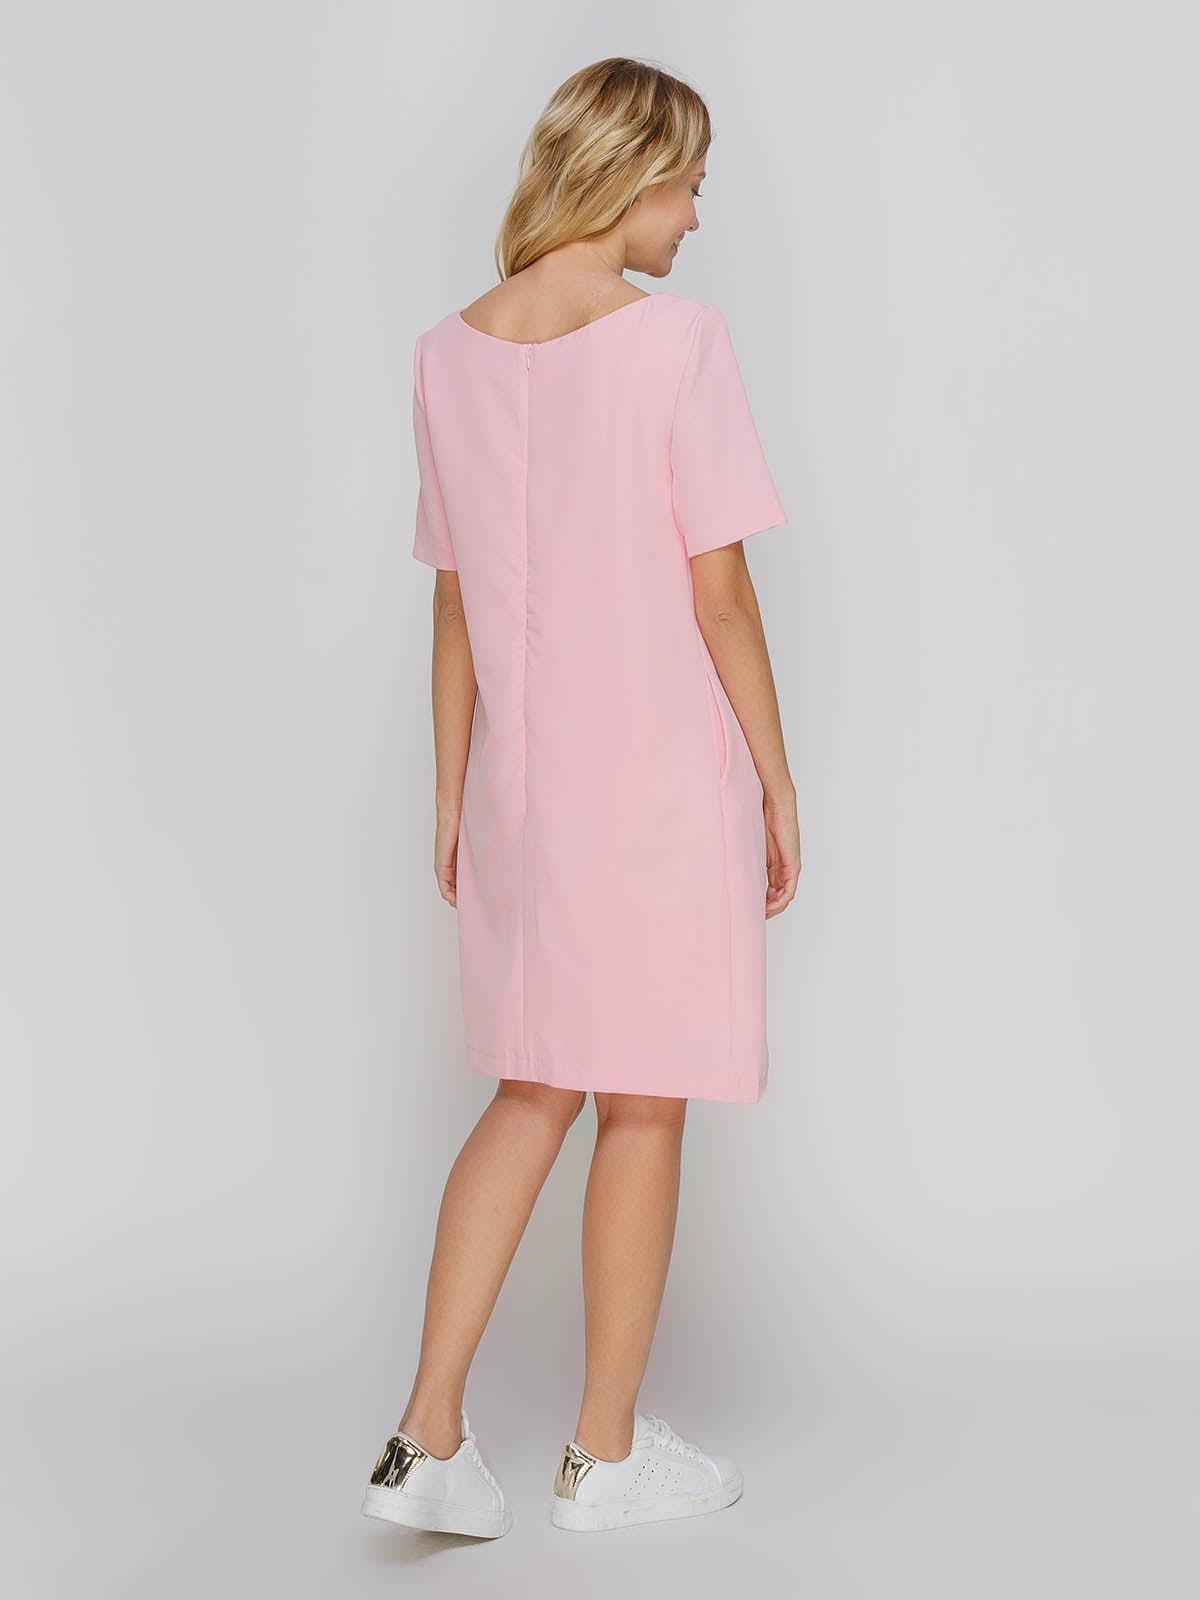 Сукня рожева | 4695405 | фото 2